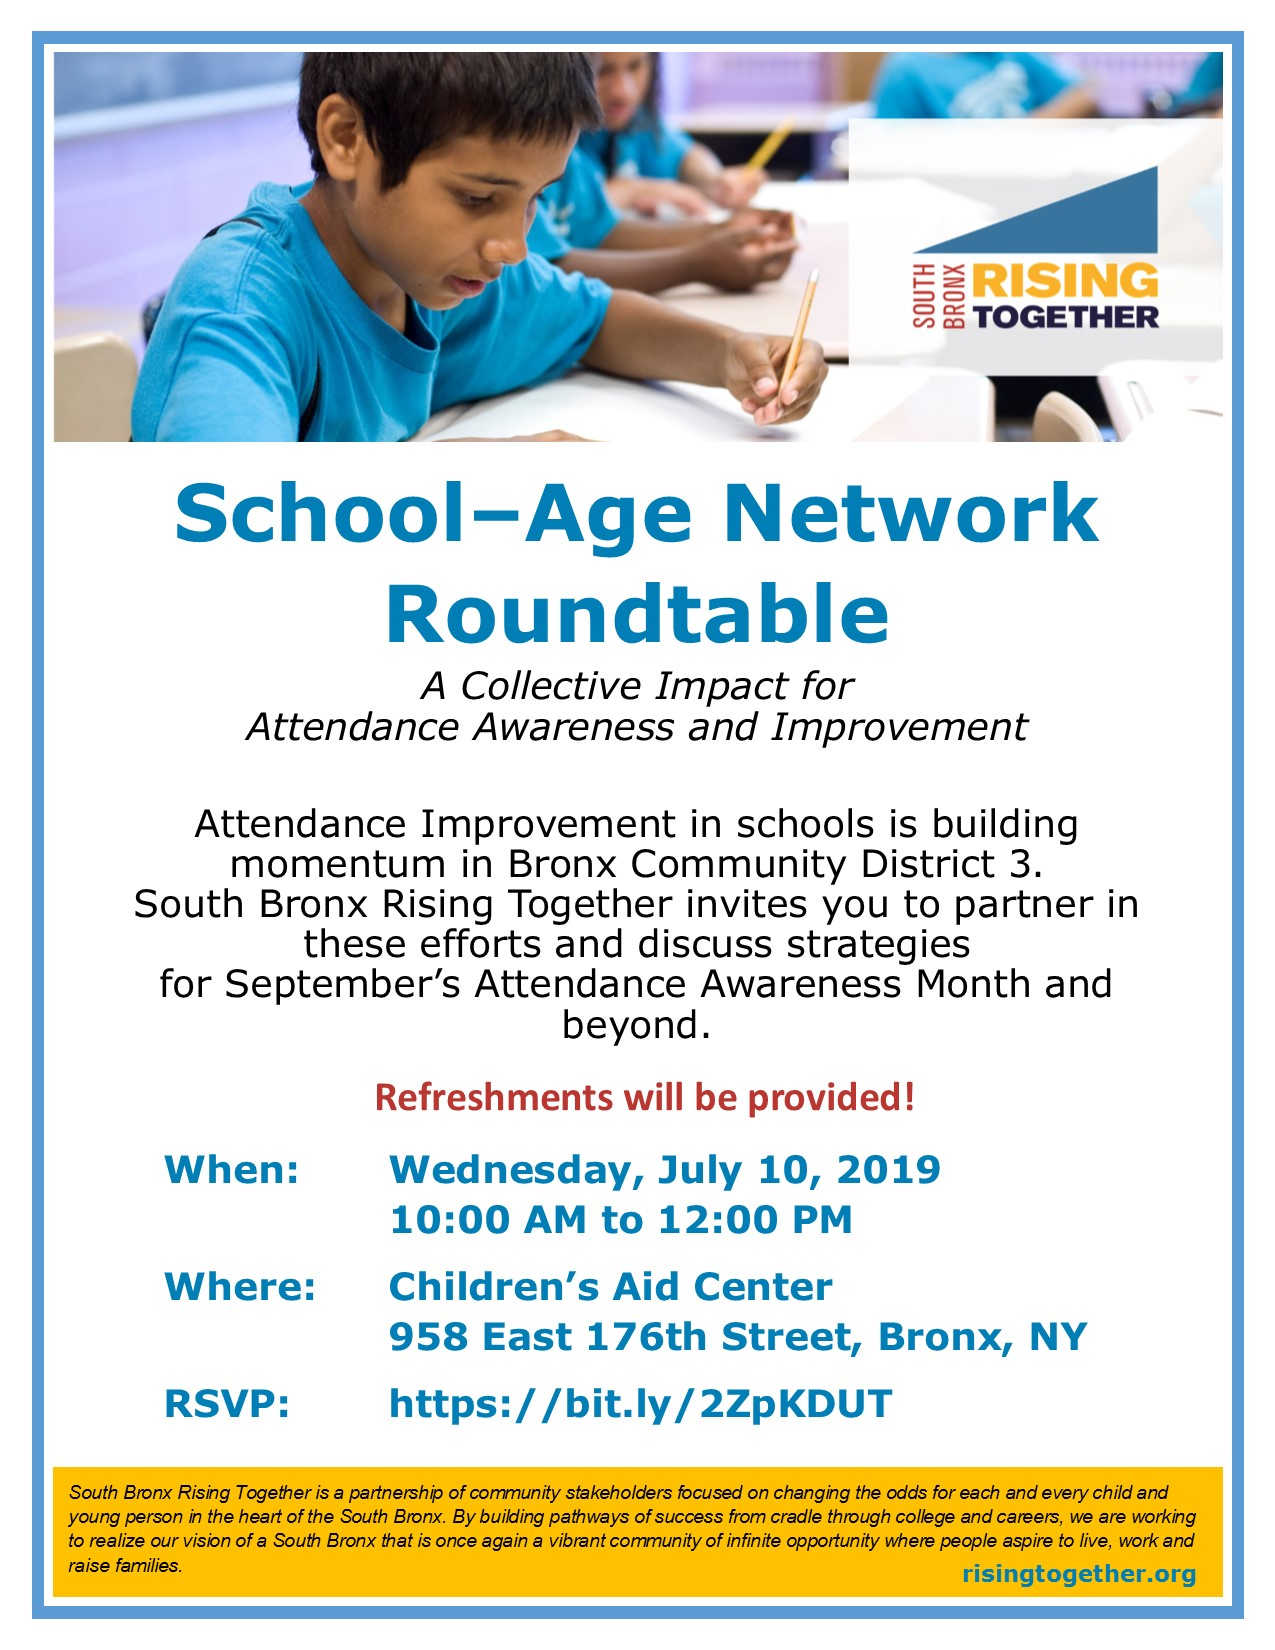 SBRT School Age Roundtable Flyer - kendall lewis.jpg